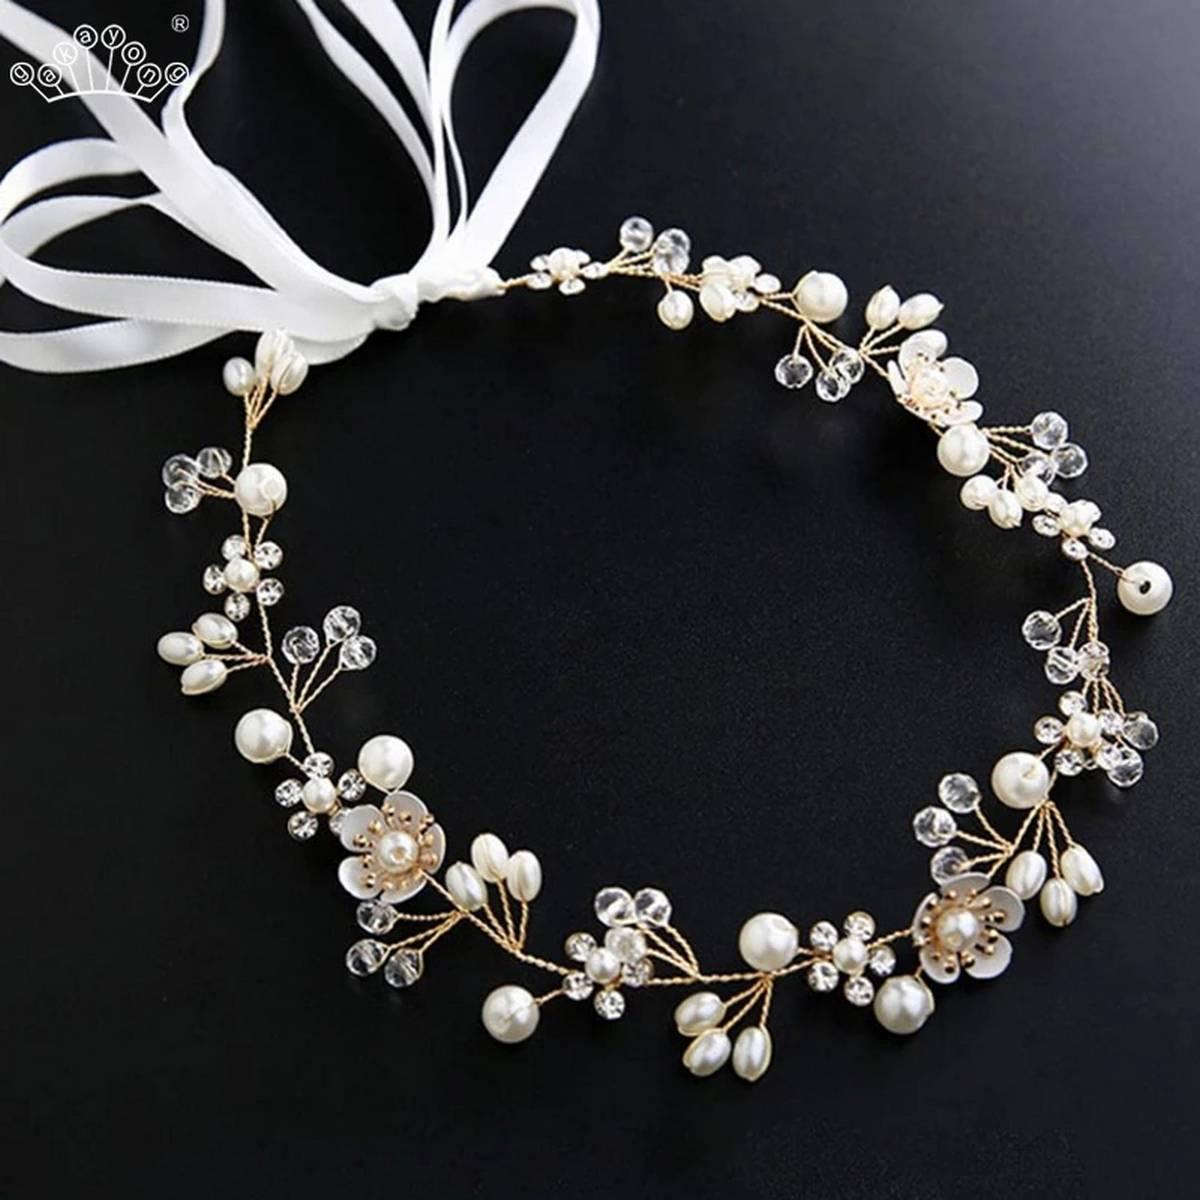 Elegant Bridal Wedding Hair Accessories Crystal Pearl Flower Girl Headband Ribbon Headpiece Hair Jewelry Accessories